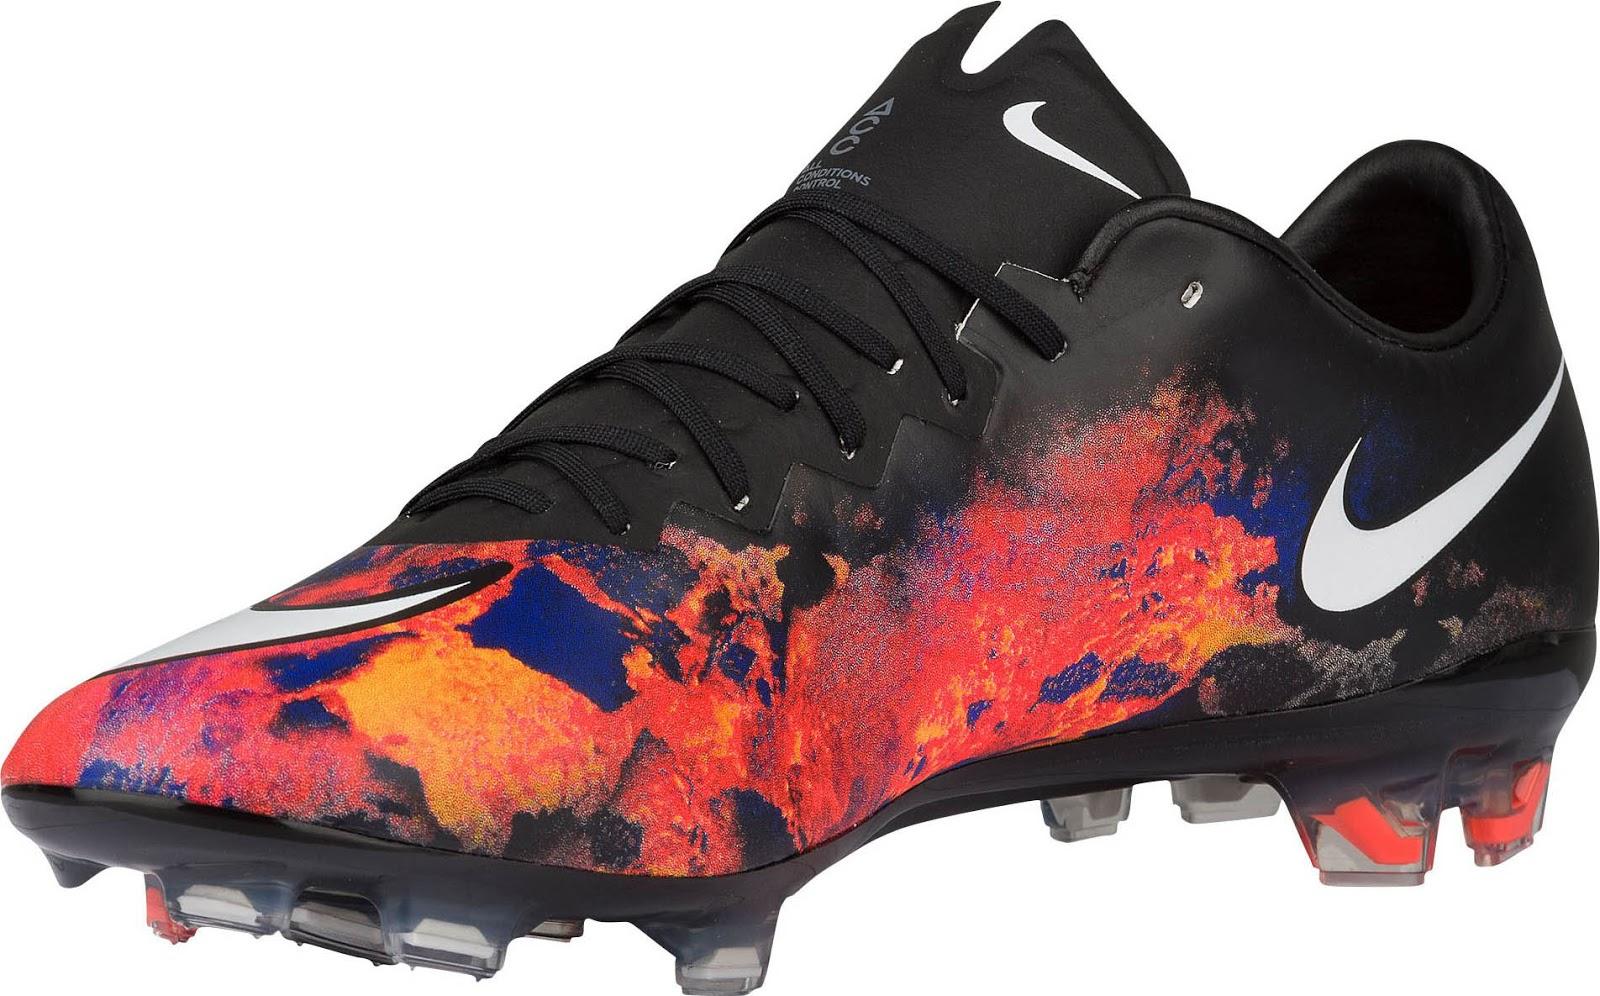 Cristiano Ronaldo New Shoes For Sale